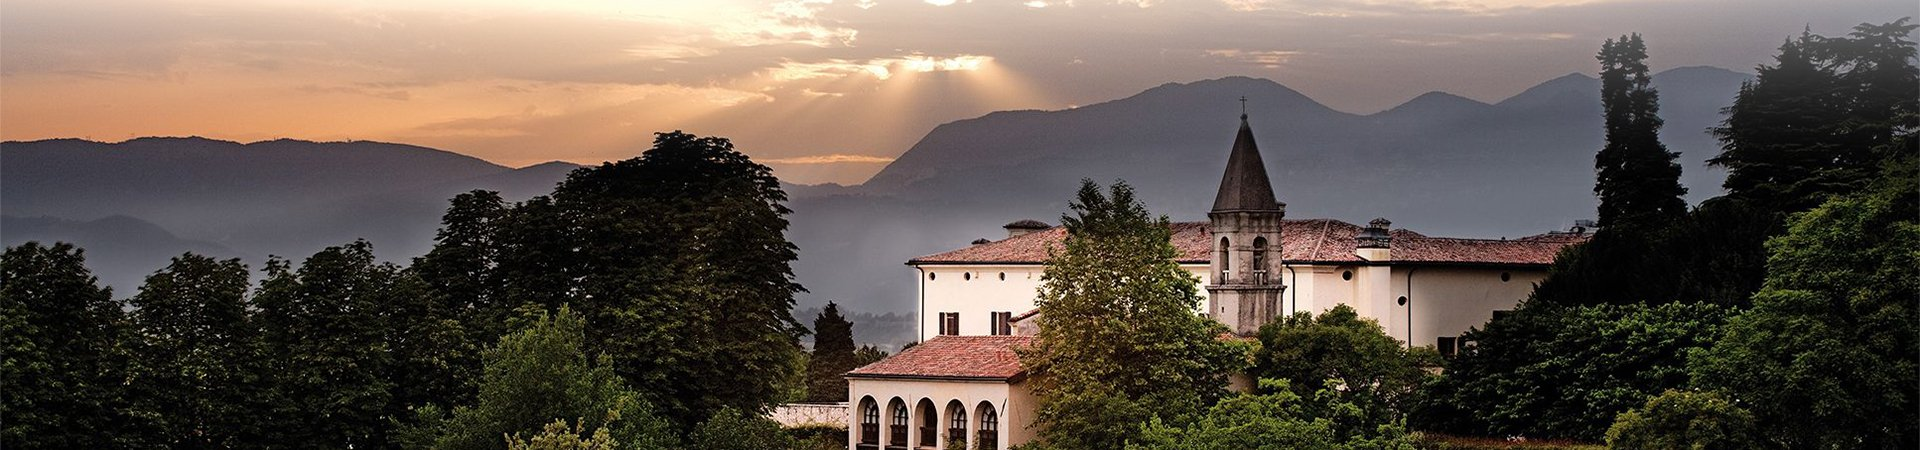 Vakantie Lombardije